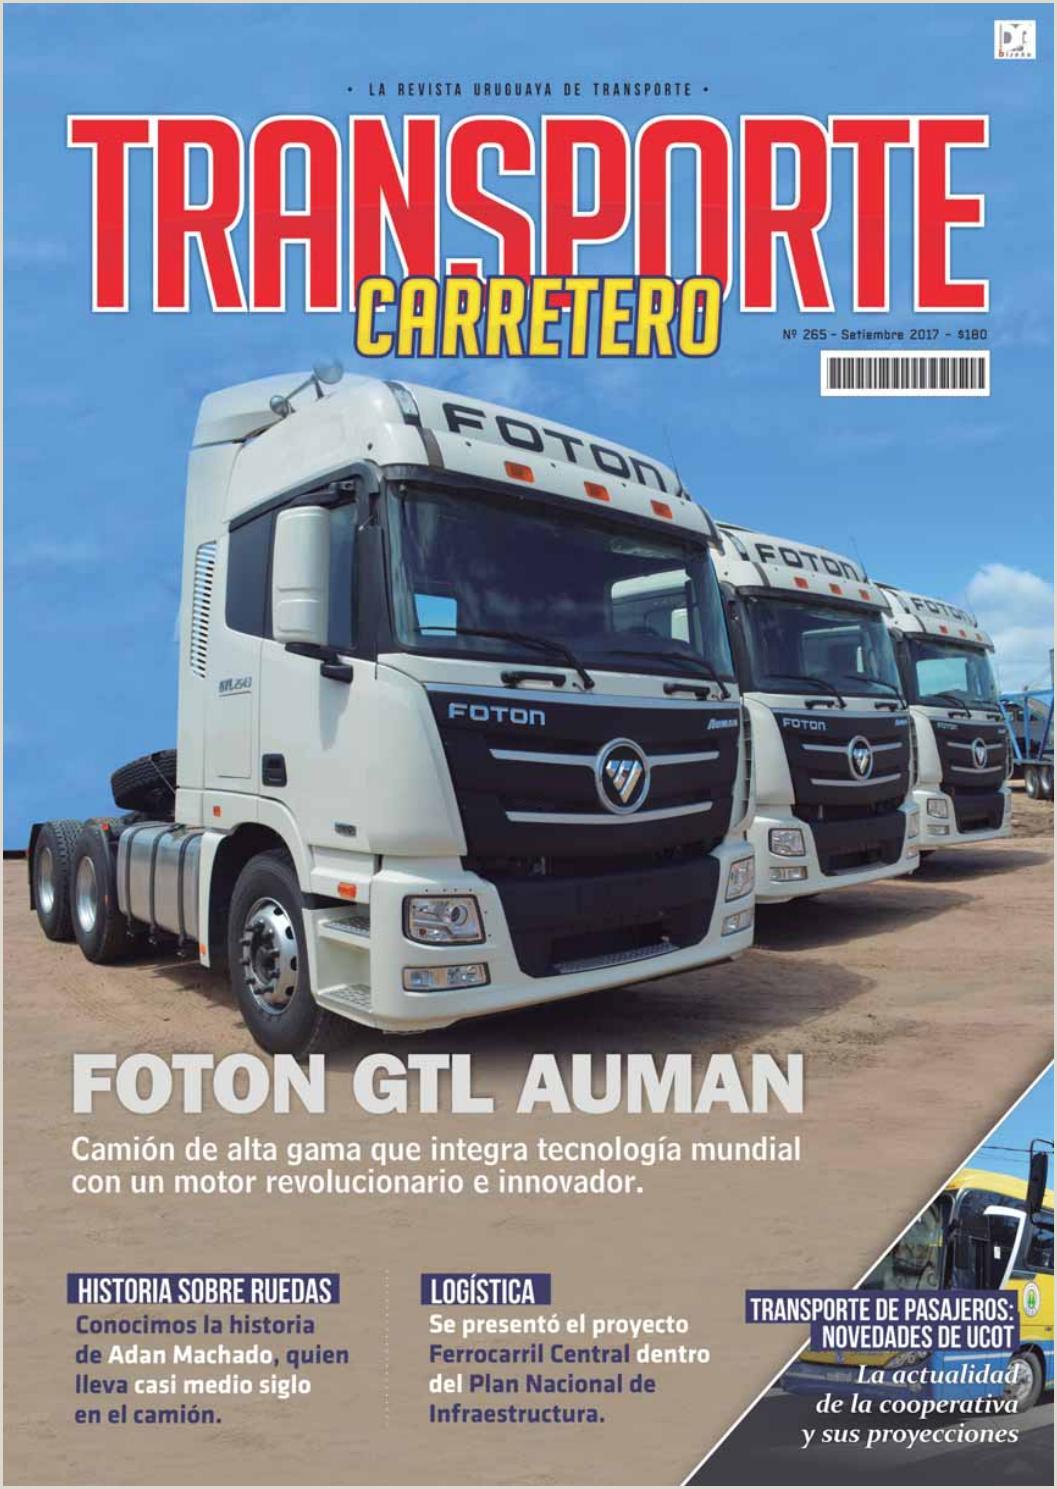 Formato De Hoja De Vida Daf Transporte Carretero Nº 265 Setiembre 2017 by Dise±o